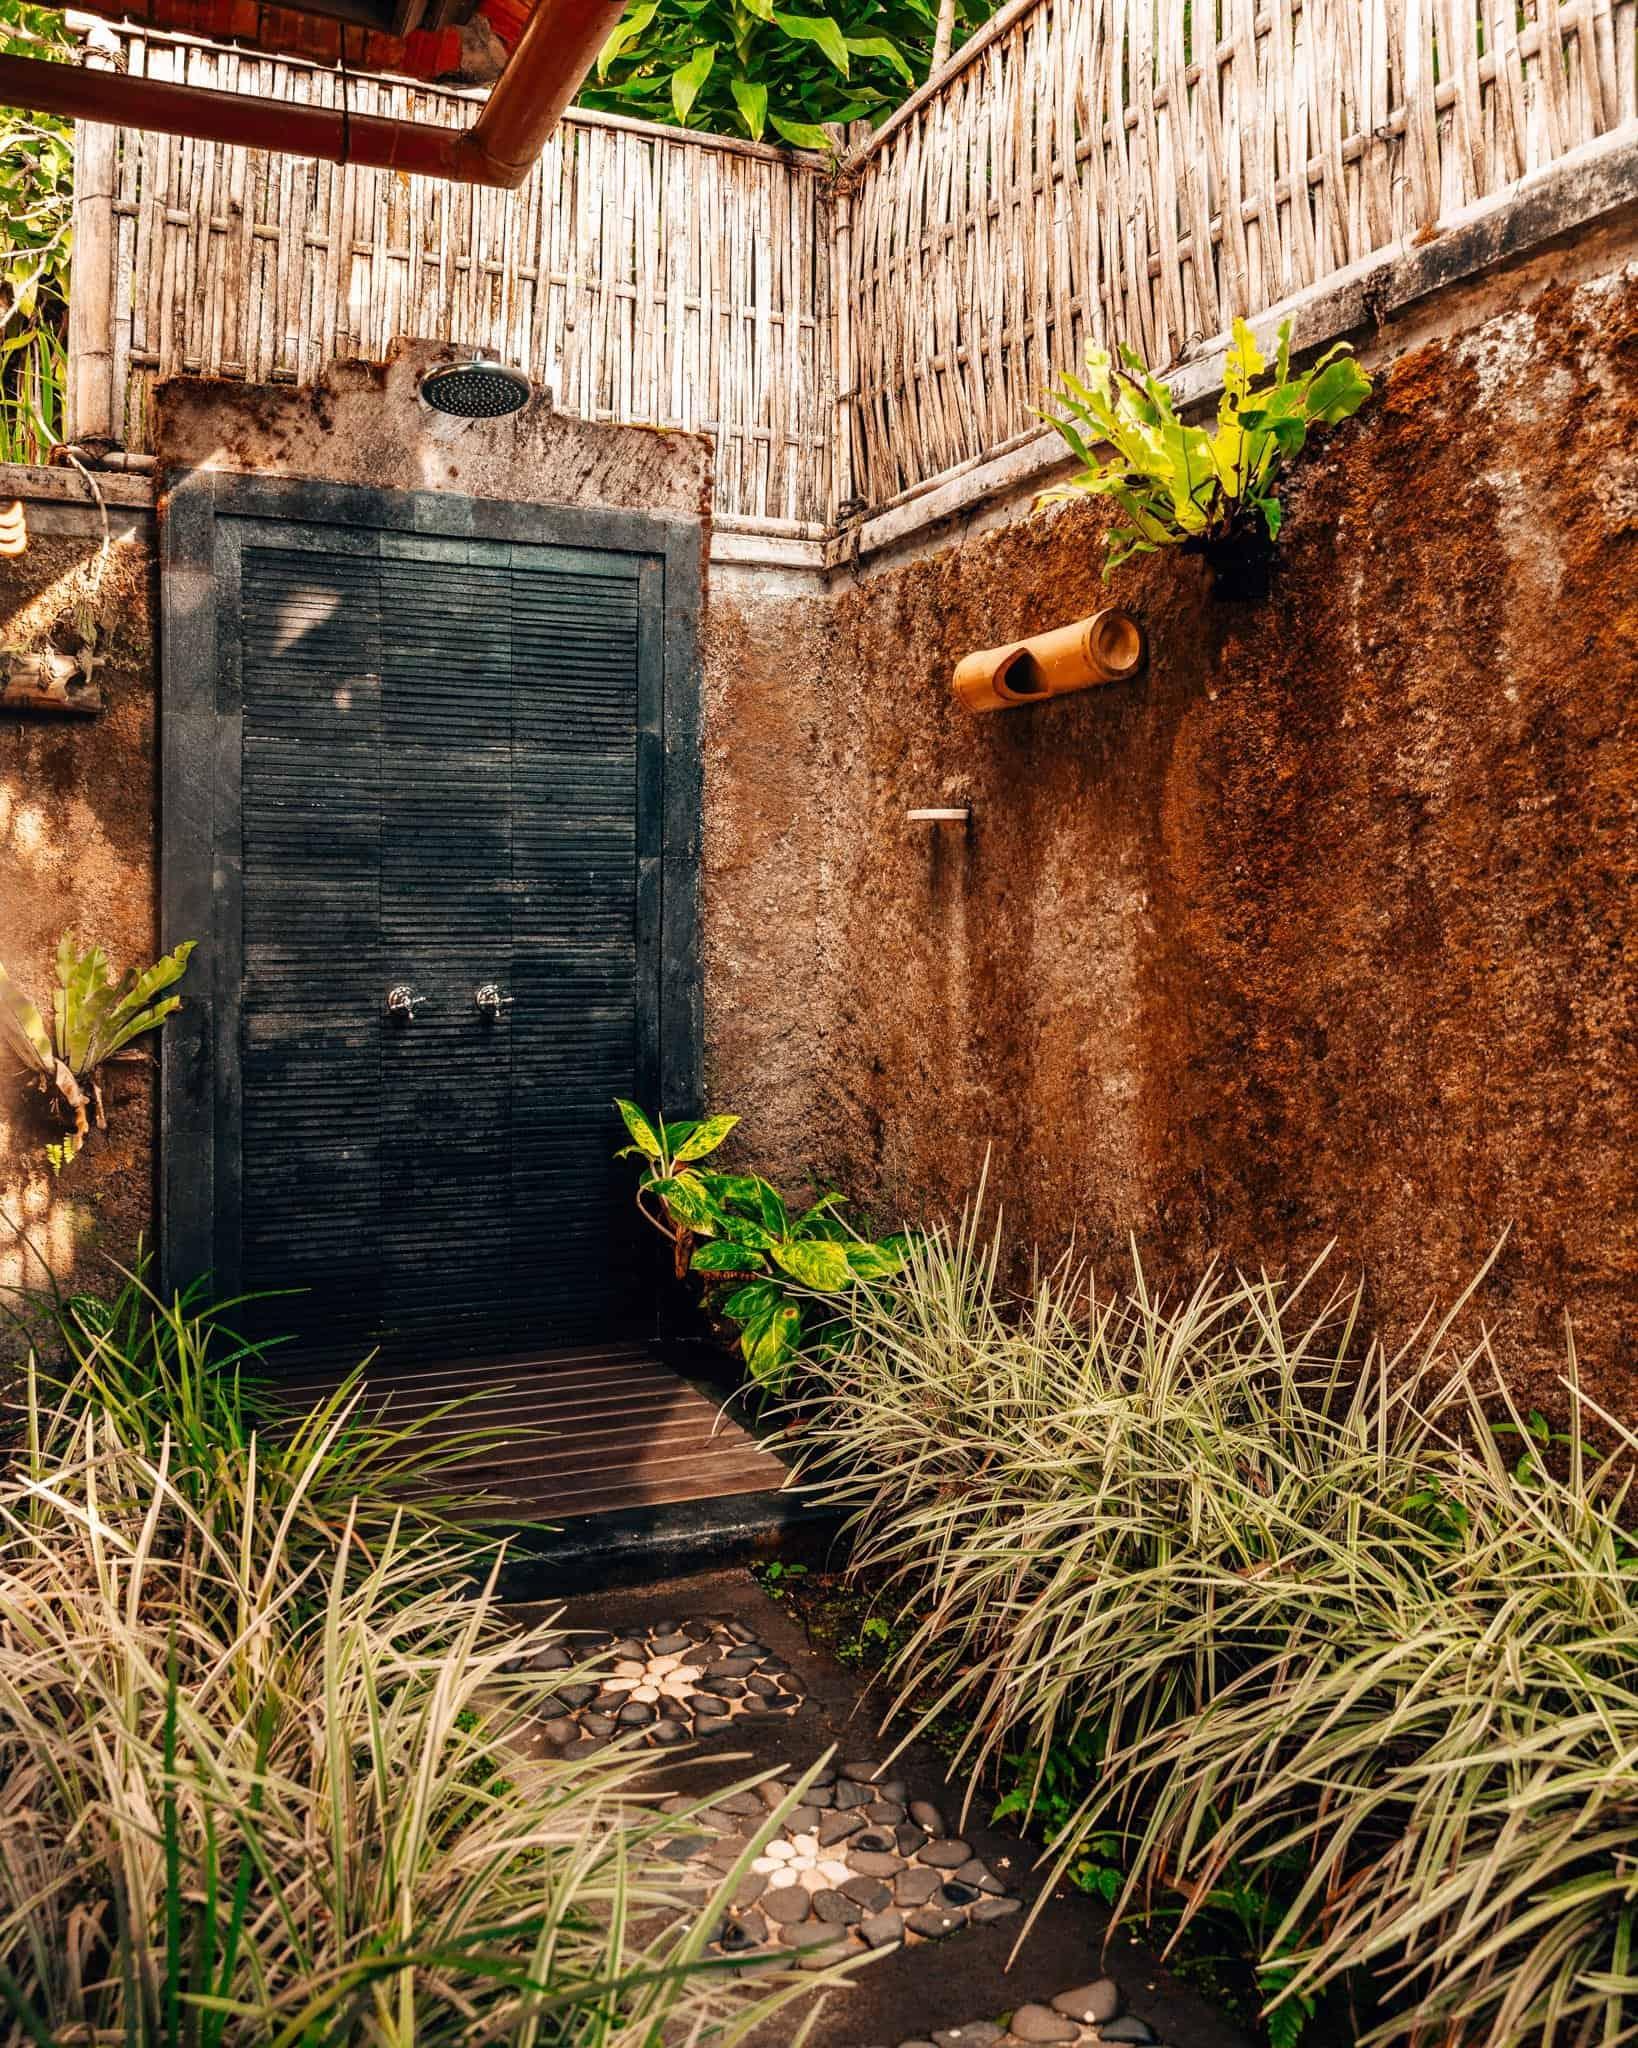 Outdoor Shower at Munduk Moding Plantation - The Next Trip